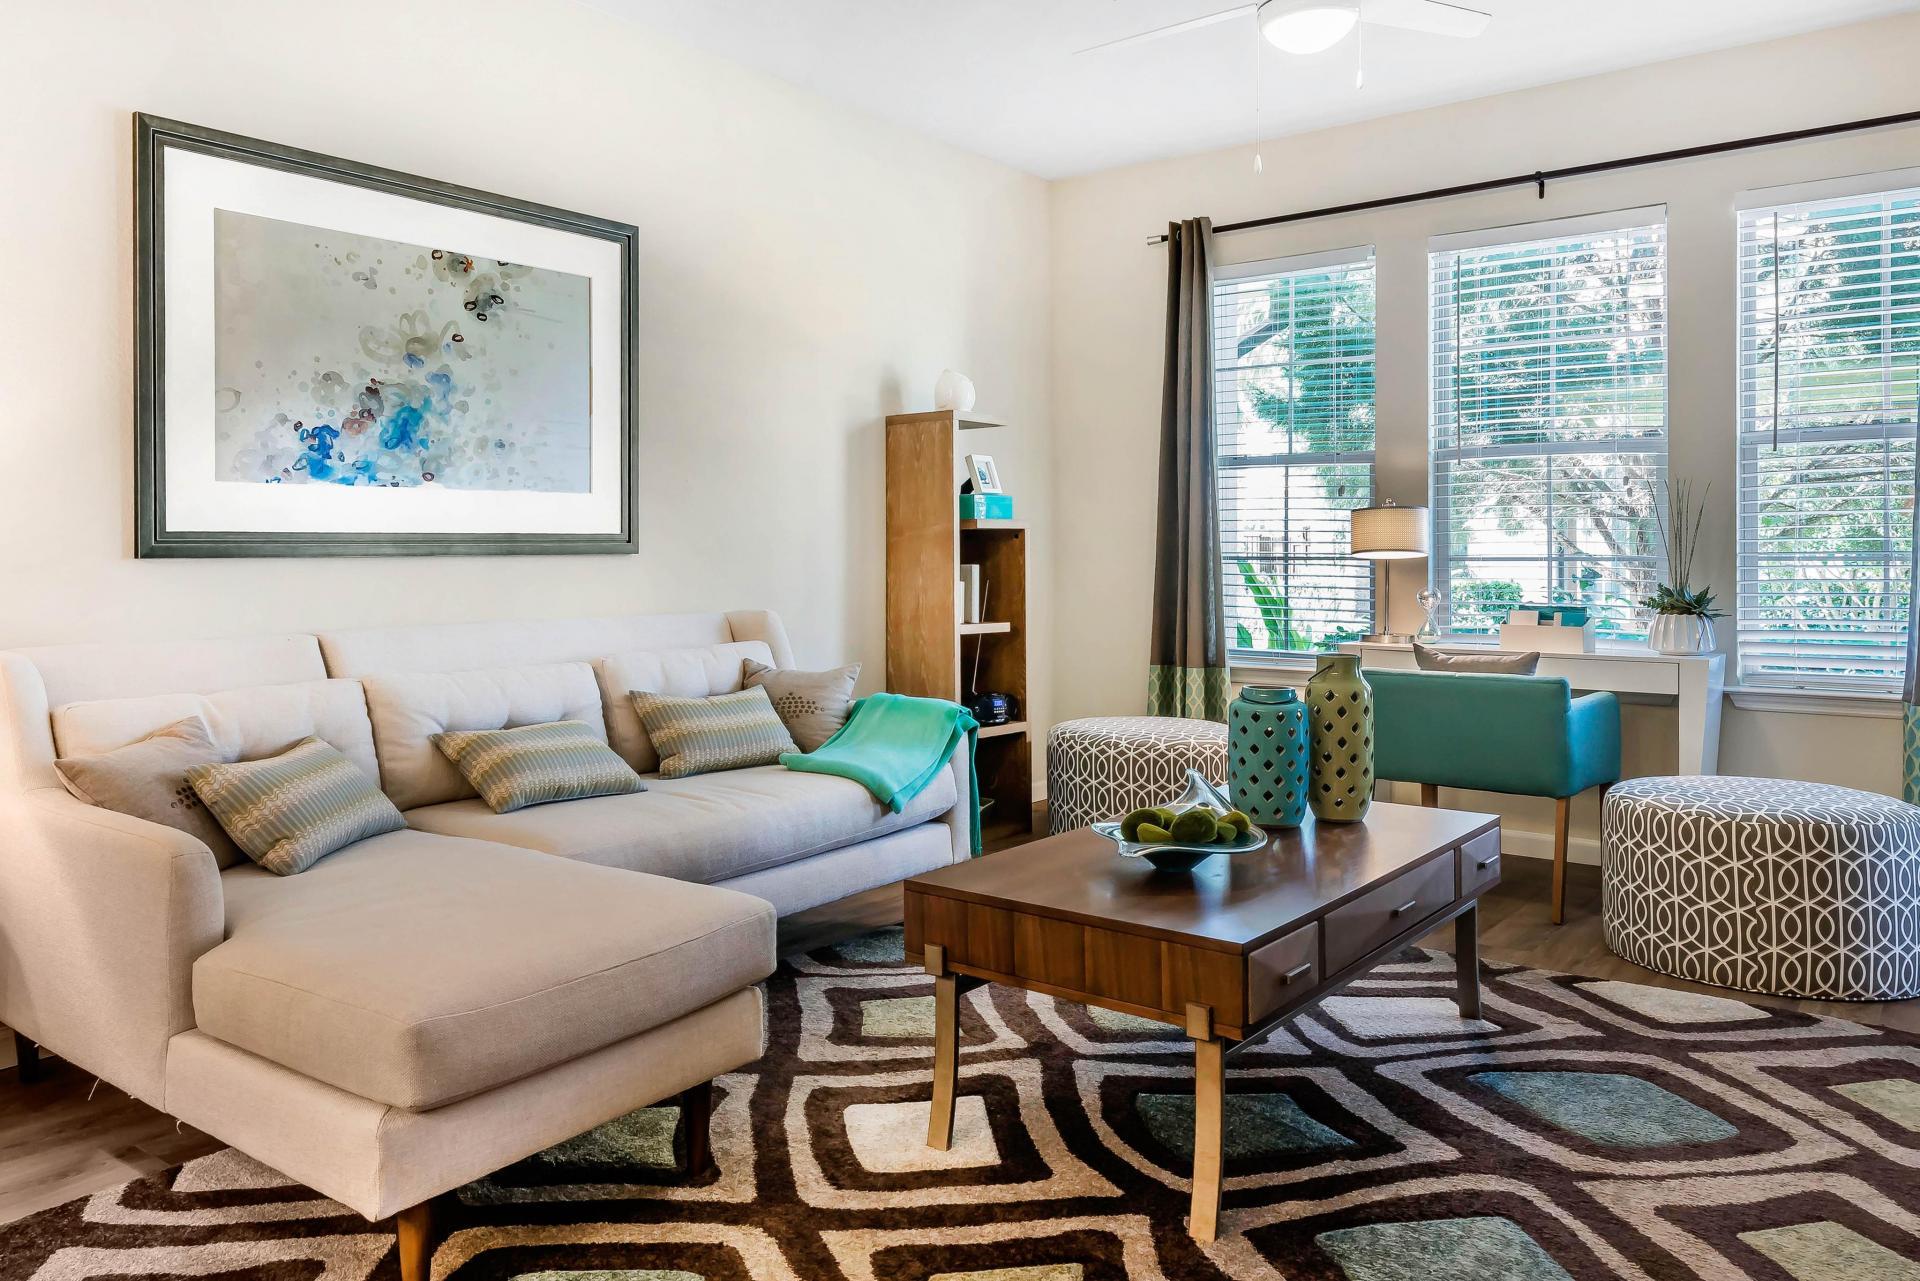 Living Room at Citra Windermere Apartments